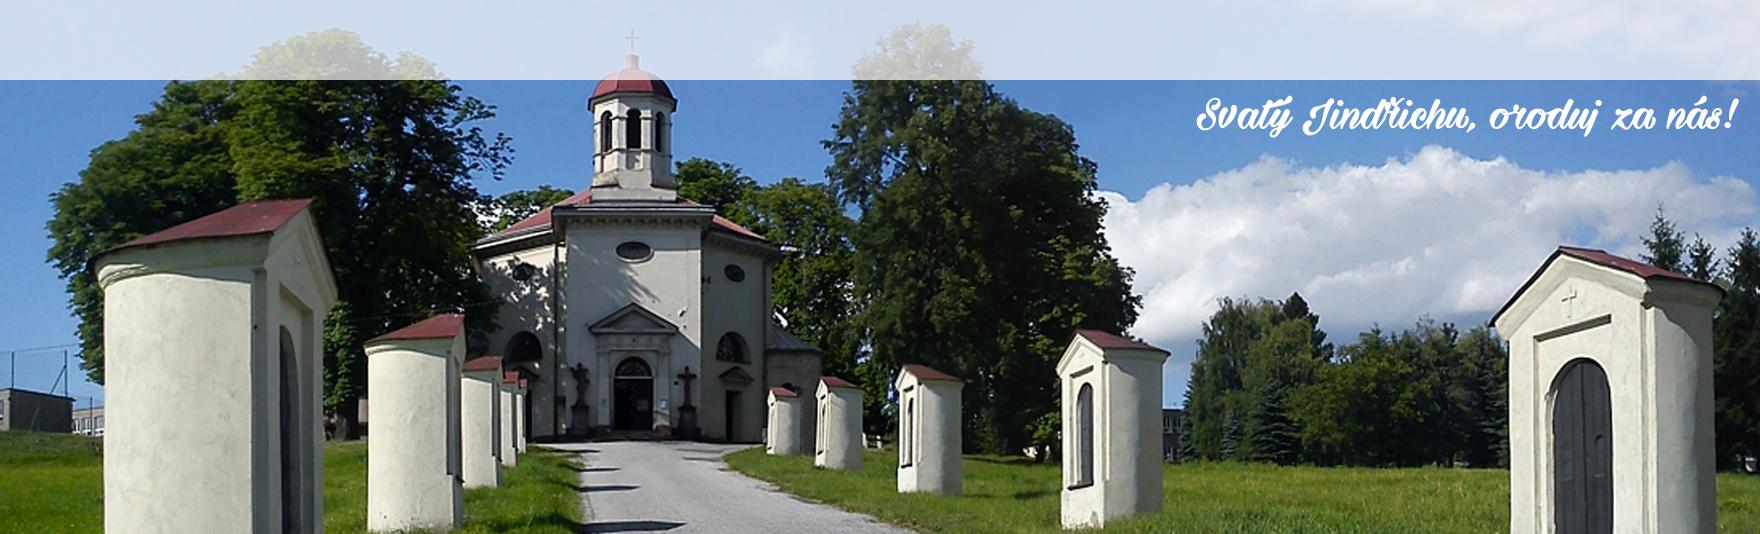 Farnost Petřvald u Karviné